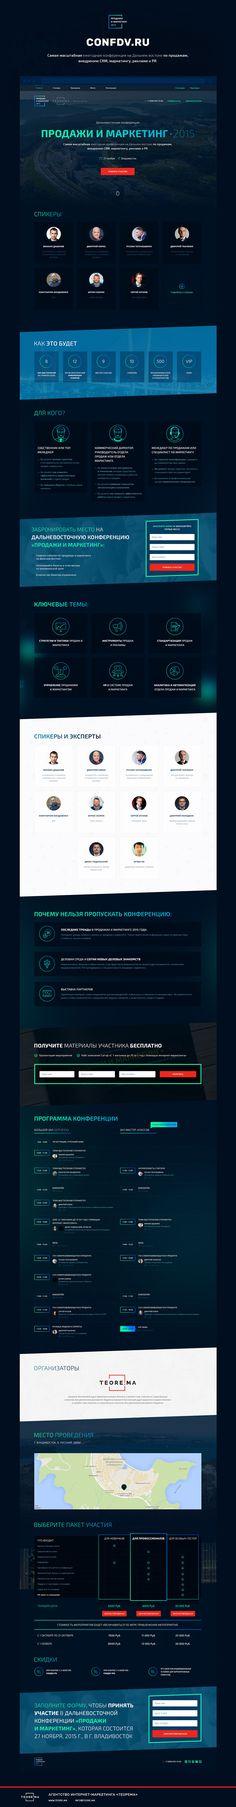 Landing page для конференции «Продажи и маркетинг» on Behance